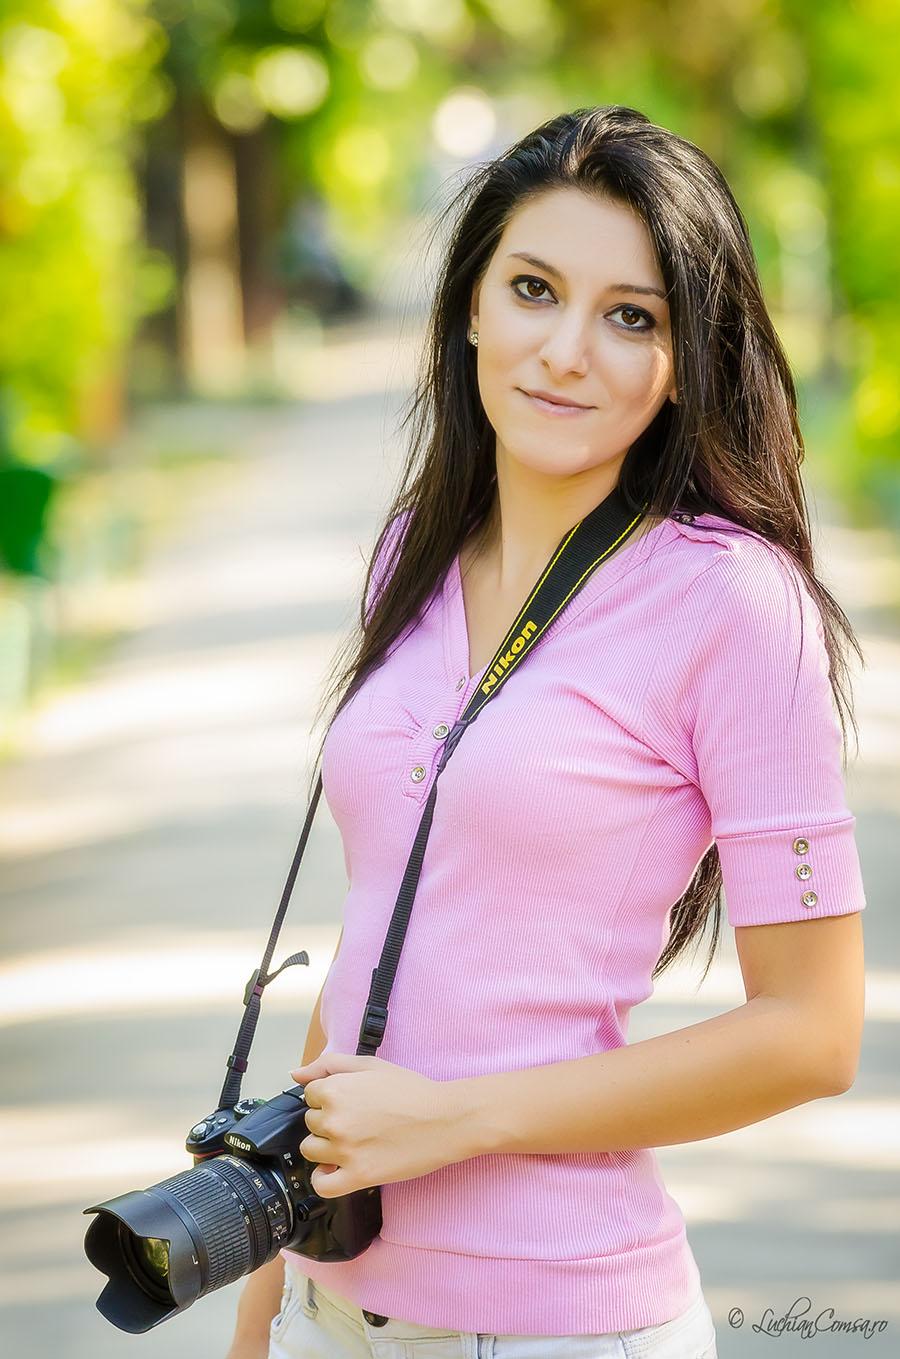 Nikon Girl!